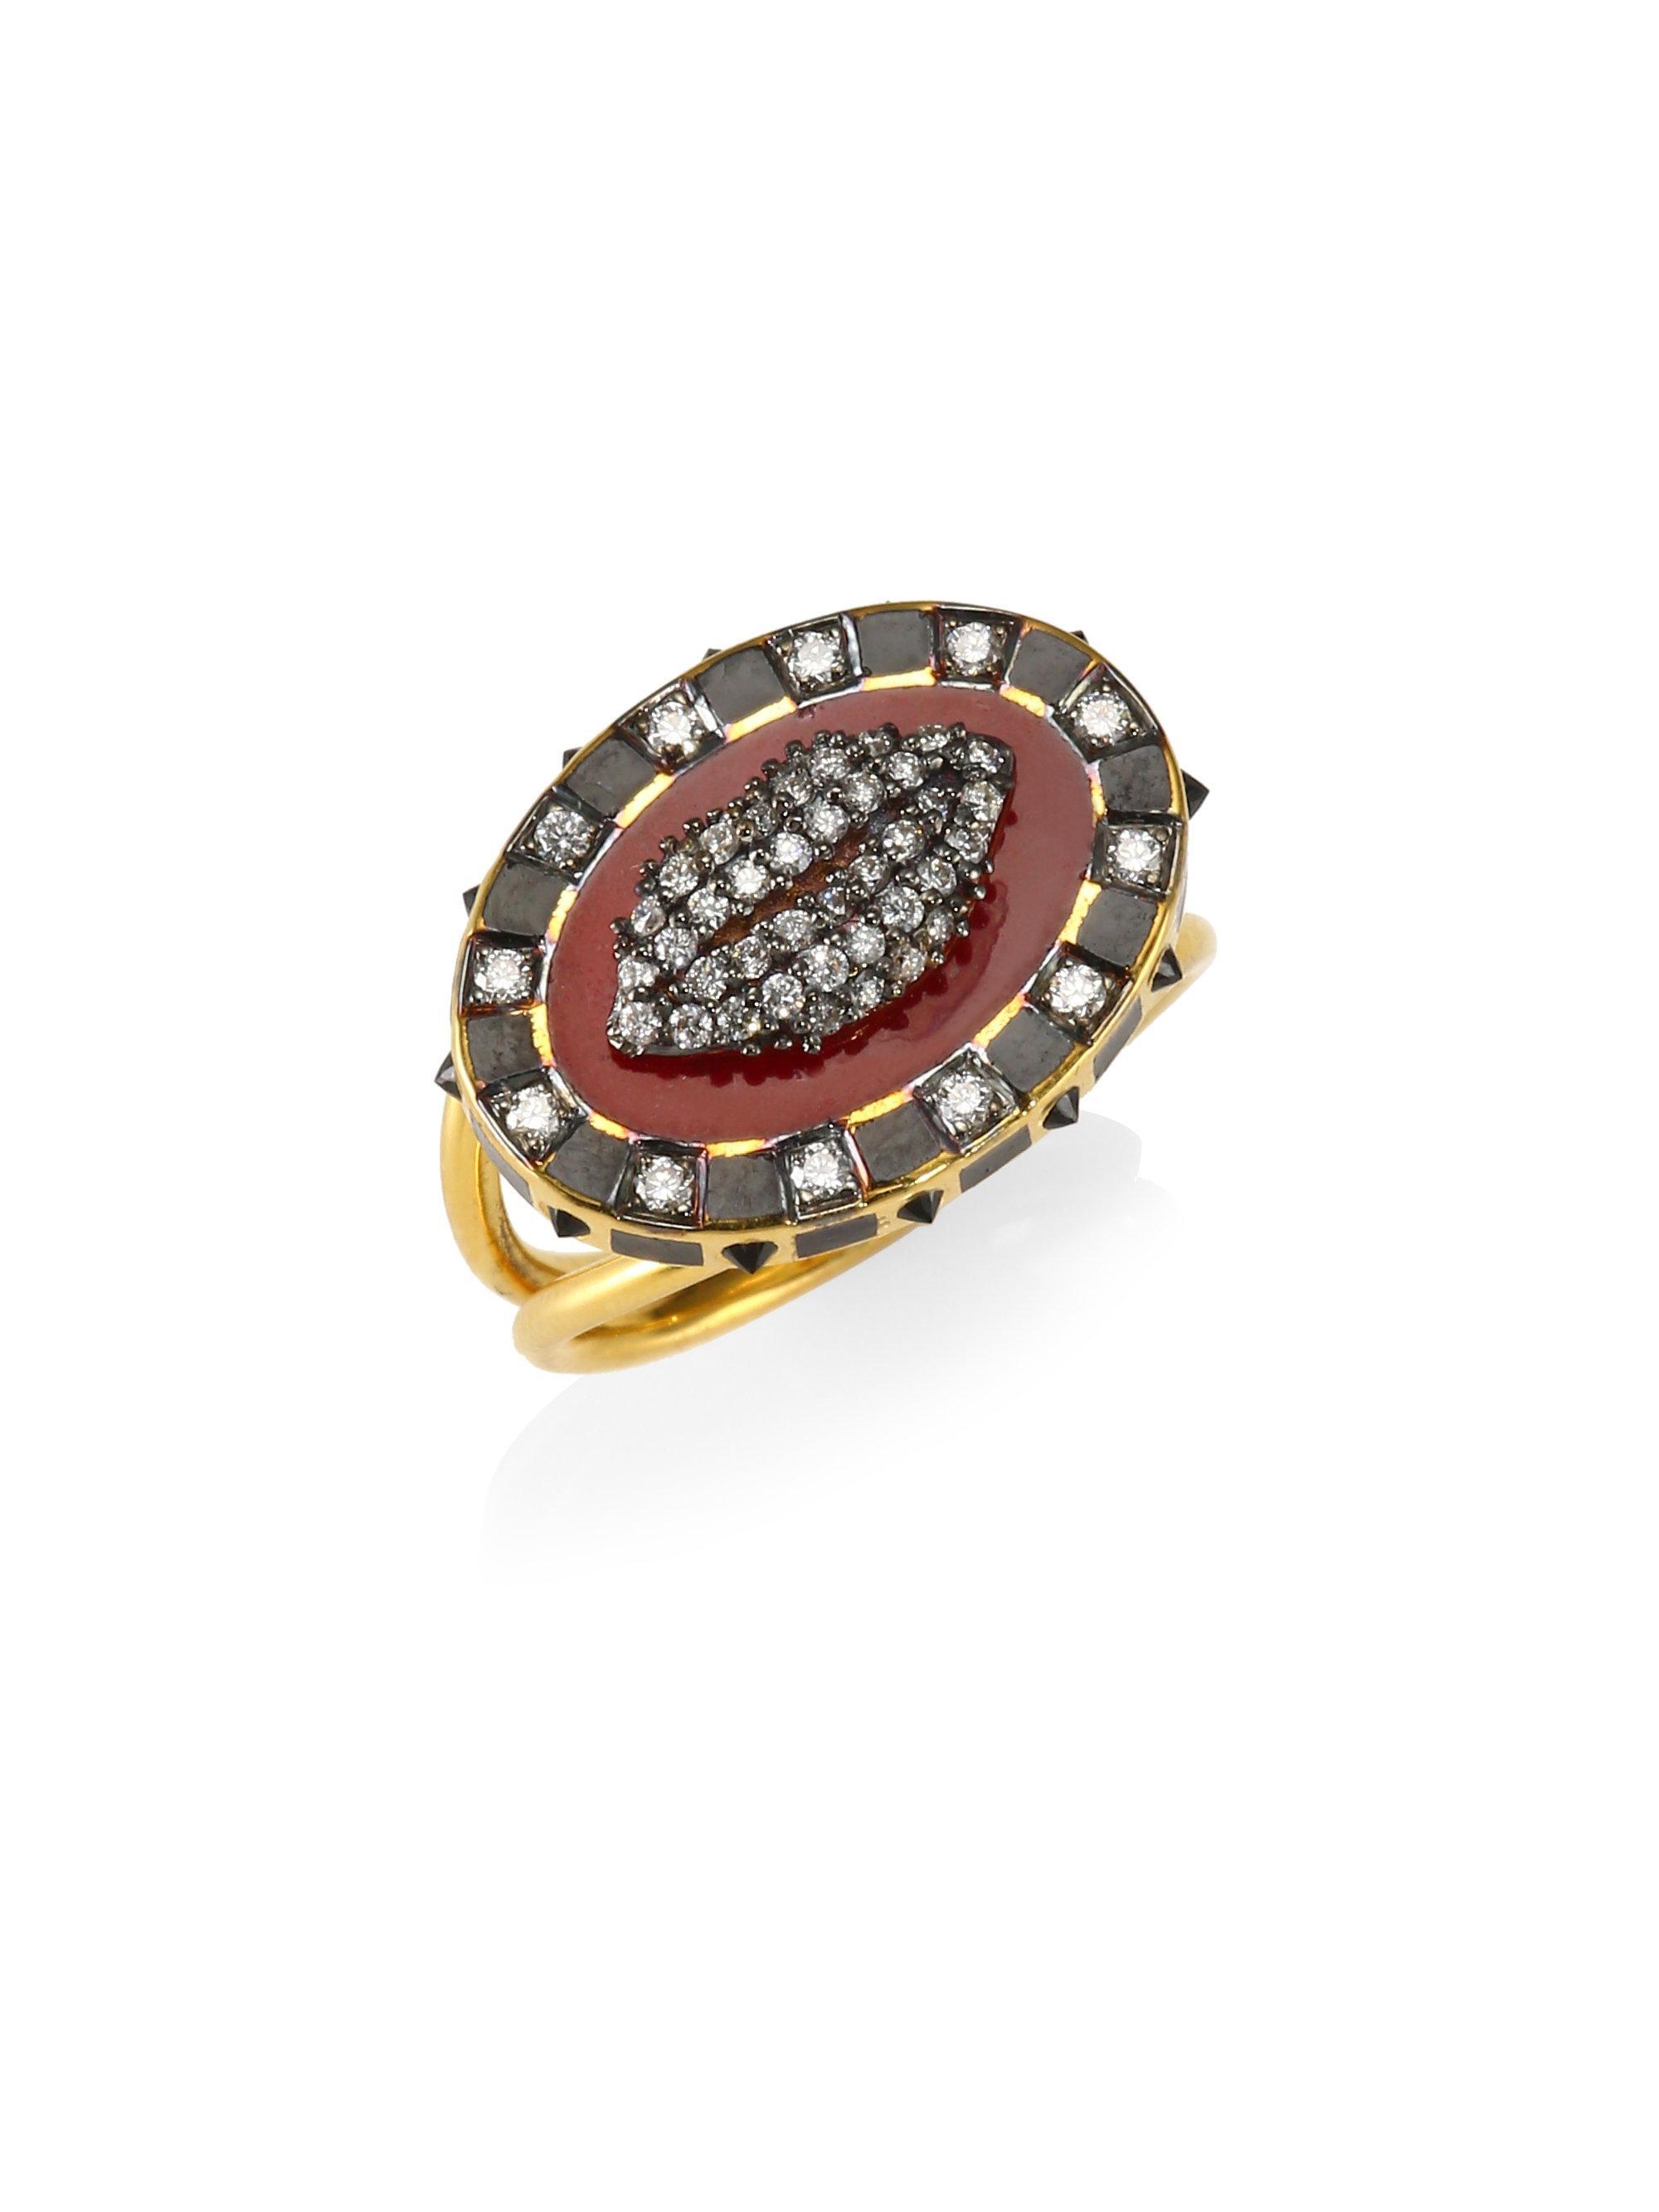 Holly Dyment 18k yellow gold Glam lip diamond ring 7GtziX